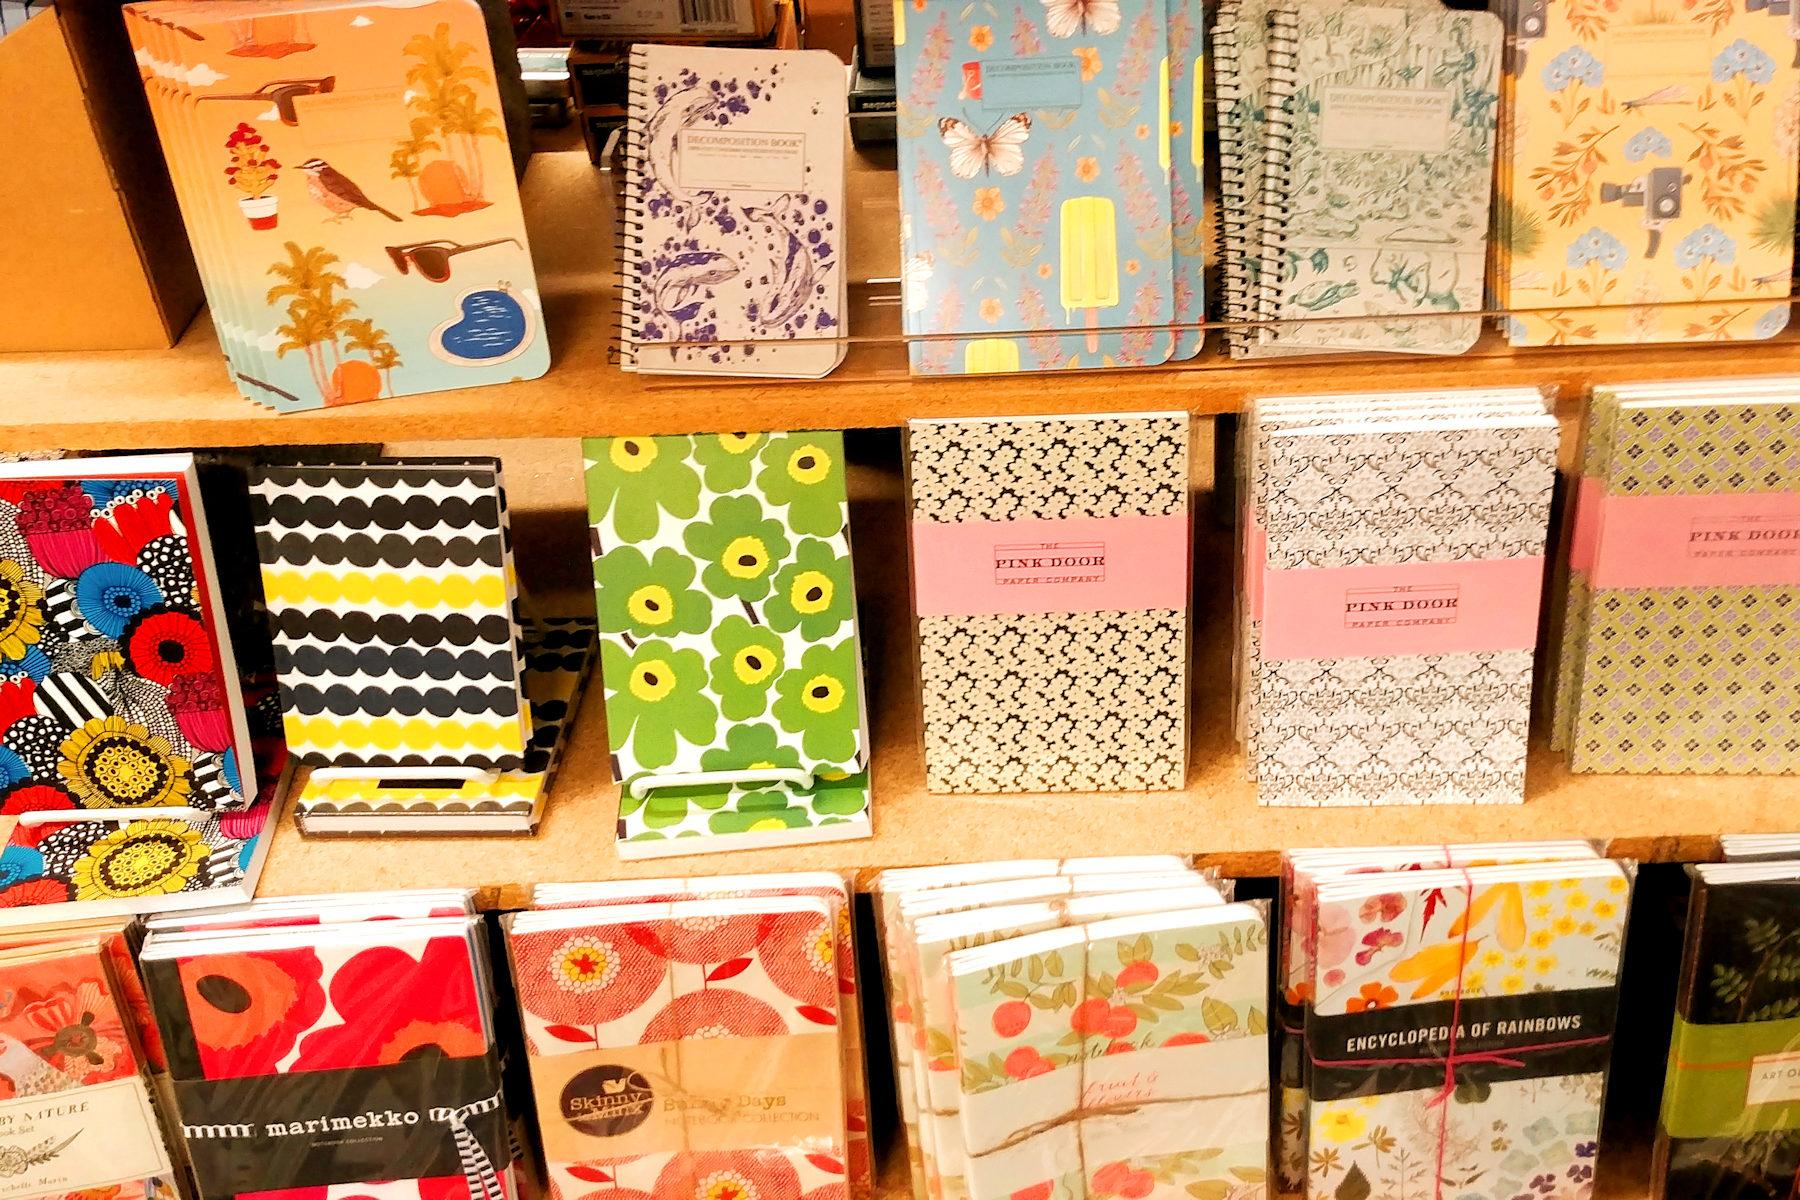 Allegheny Art - Notebooks